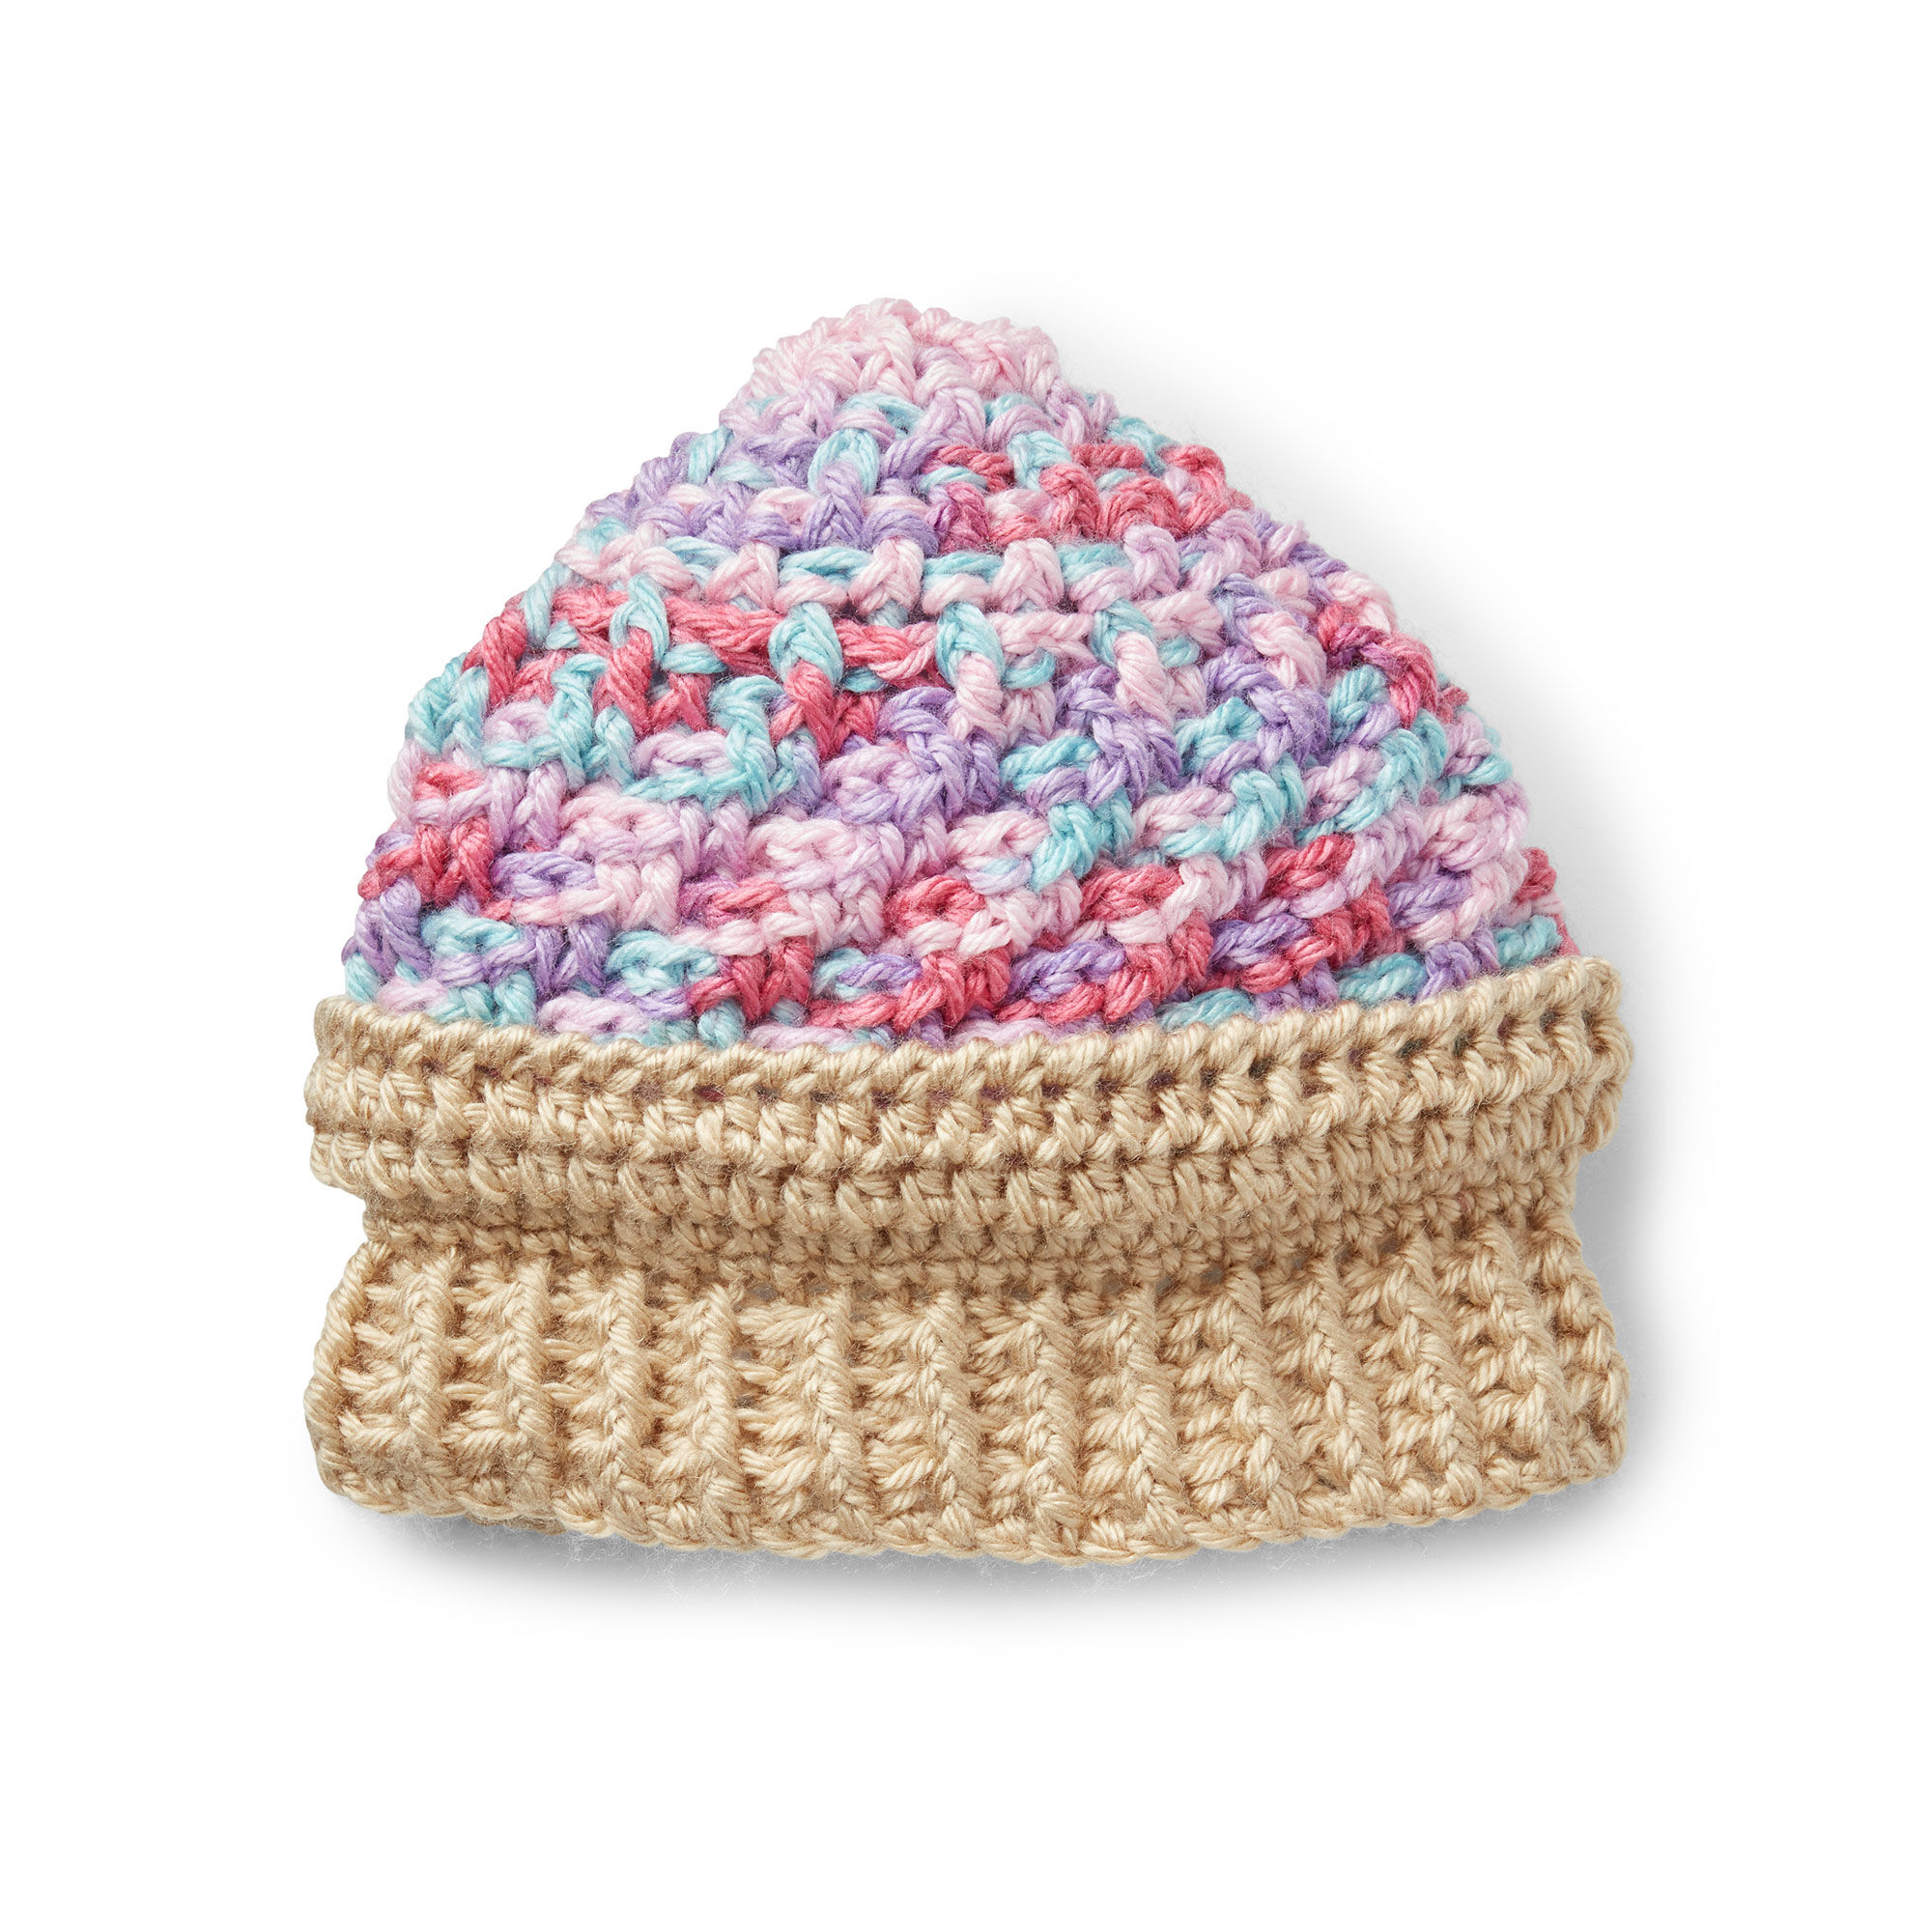 Caron Ice Cream Swirl Crochet Hat, 6-12 mos - Version 1 Pattern ...